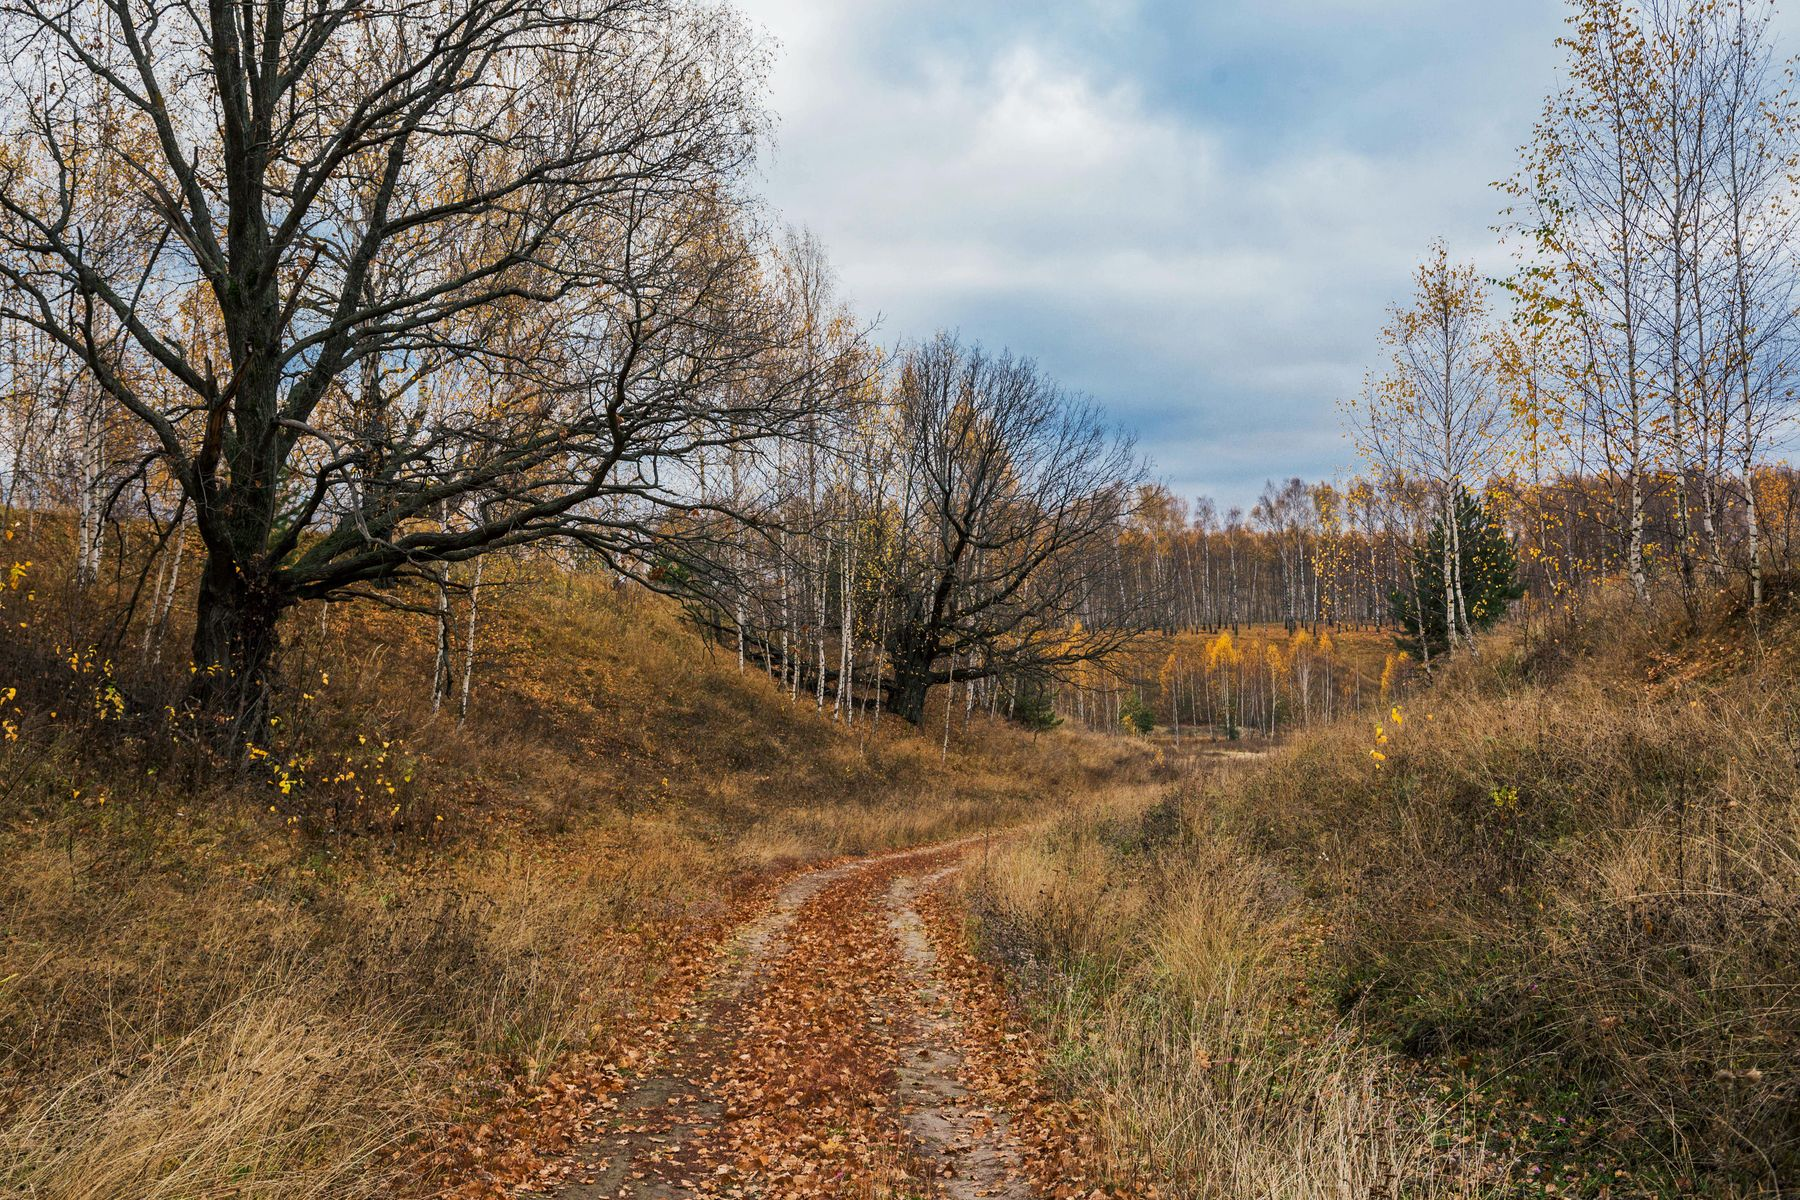 *** природа пейзаж осень дорога татарстан новочувашский